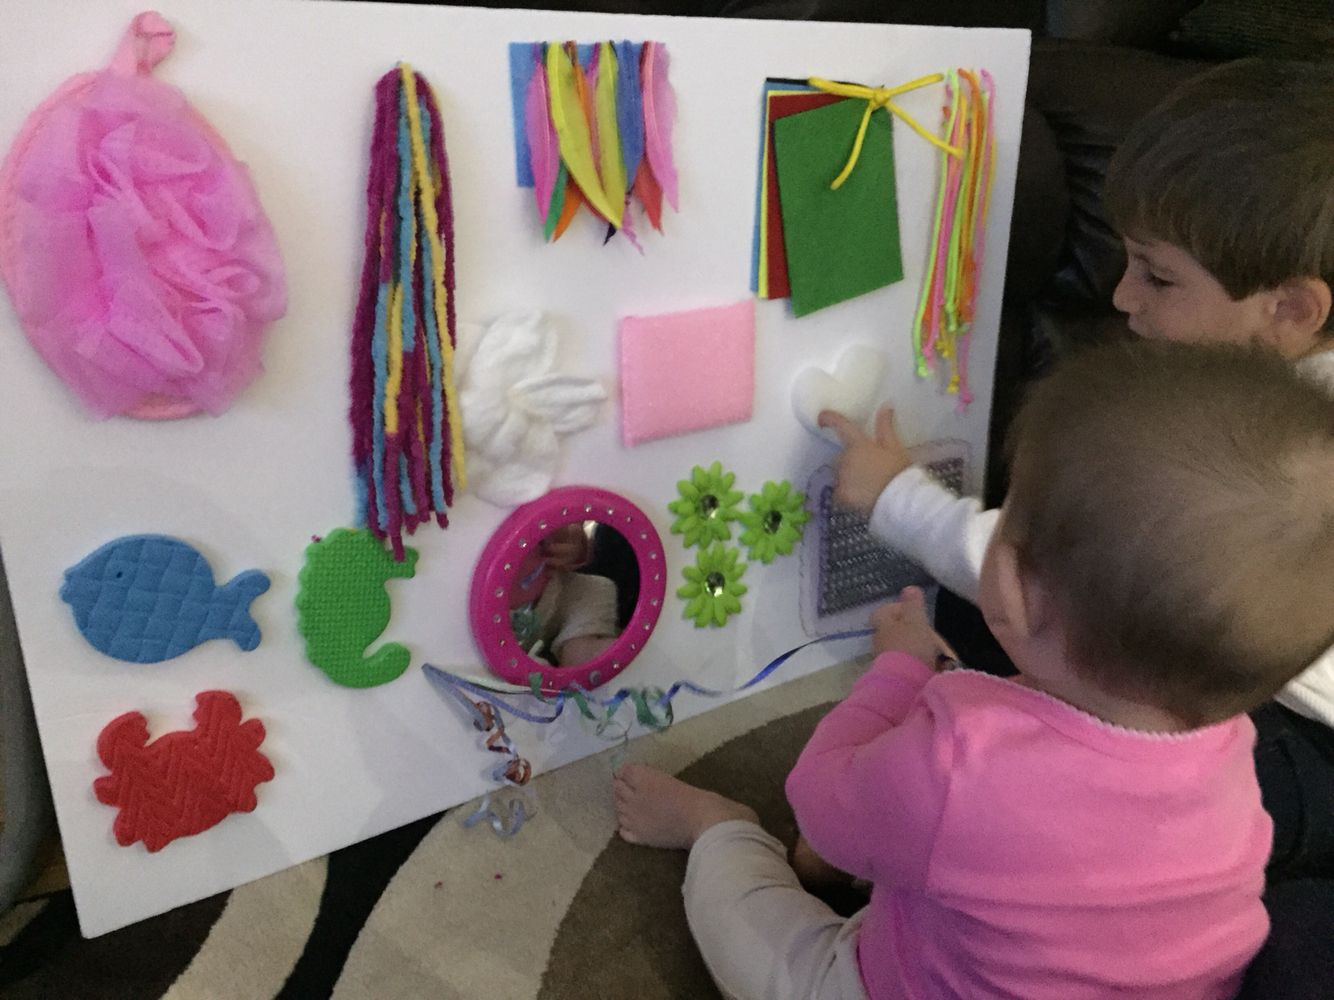 Sensory Toys For 12 Month Old : Sensory board diy month old baby pinterest